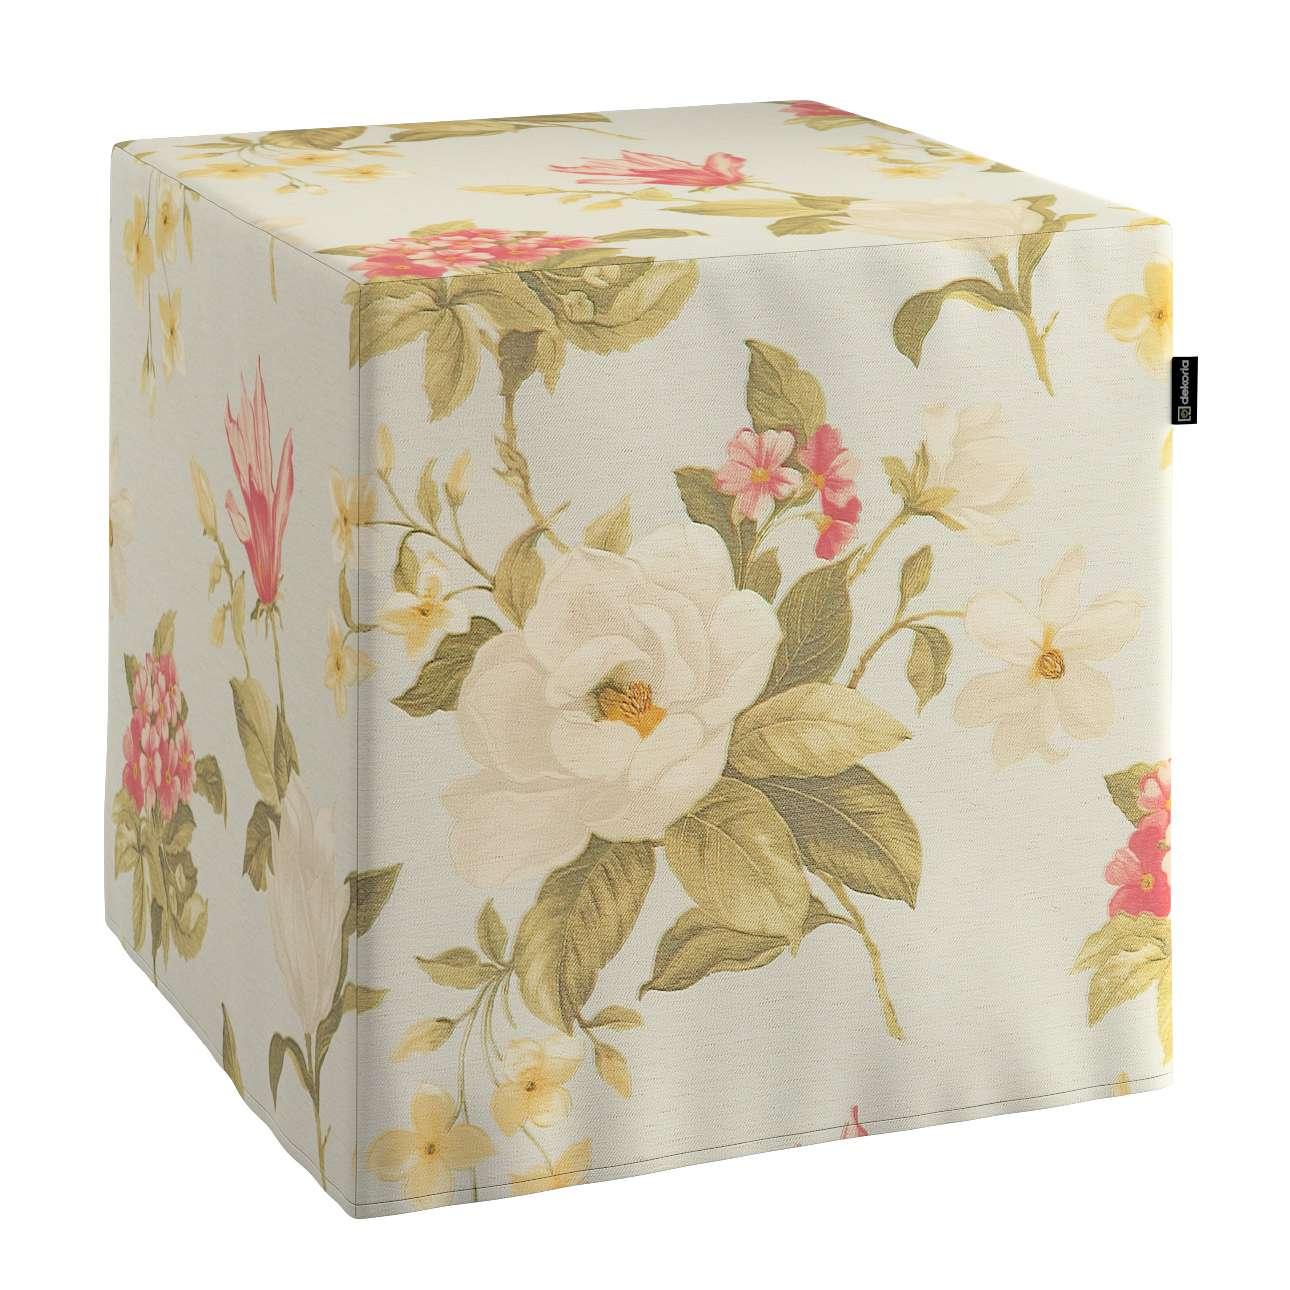 Sedák Cube - kostka pevná 40x40x40 v kolekci Londres, látka: 123-65